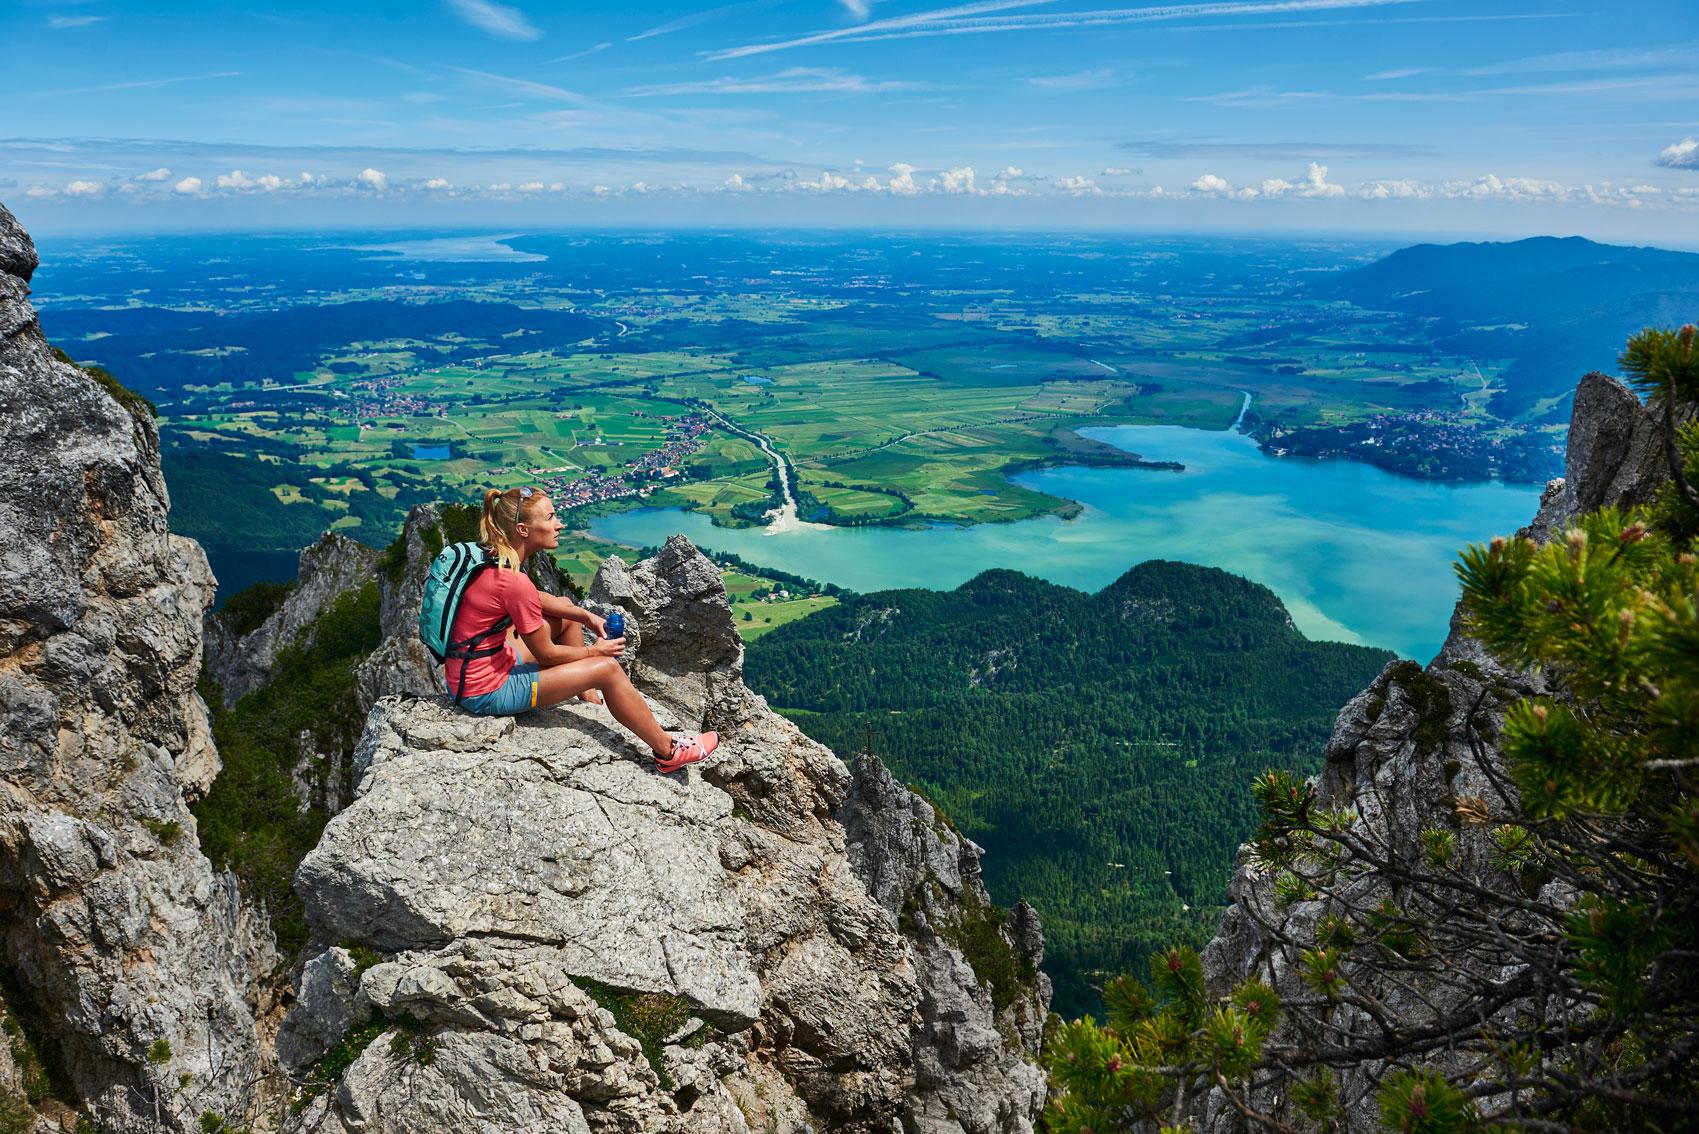 Michael_Reusse_Herzogstandgrat_munichmountaingirls-trailrunning-berglauf_Running_Caja-Schoepf